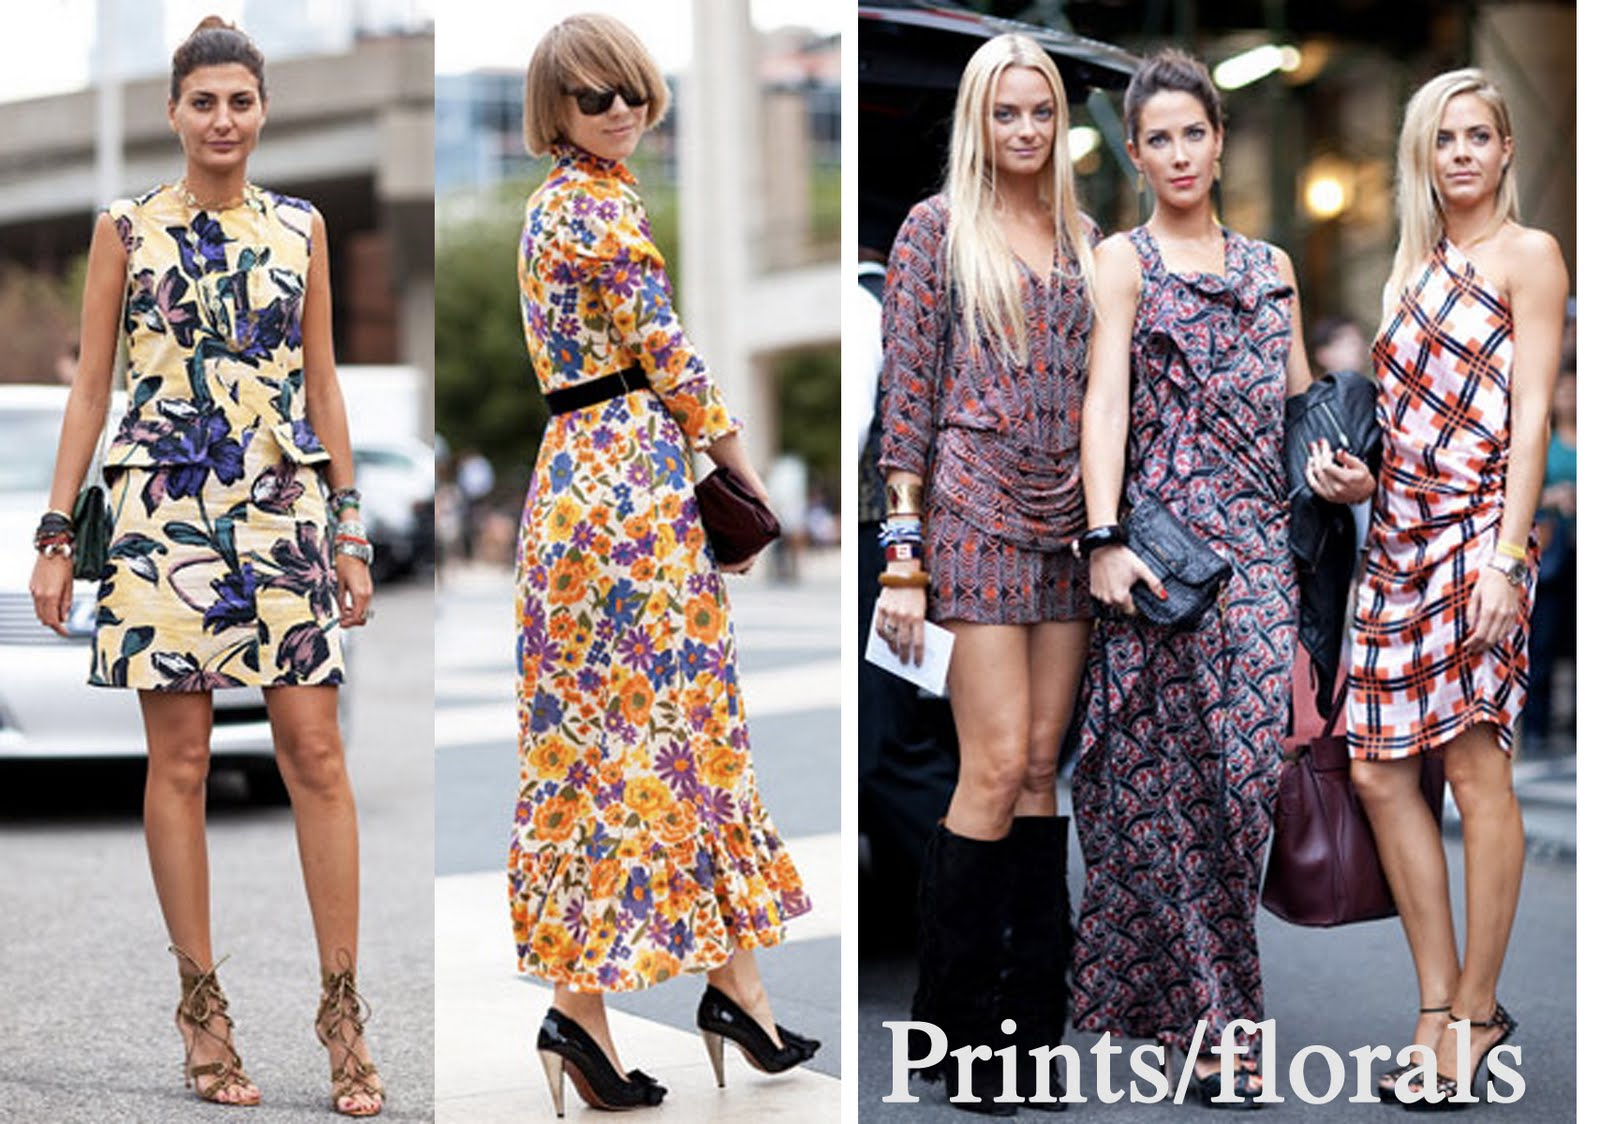 http://4.bp.blogspot.com/-6C-pZWsXmzw/TnAhgAP7Y4I/AAAAAAAAELg/GibDRIMHFrA/s1600/Fashion+week3+.jpg